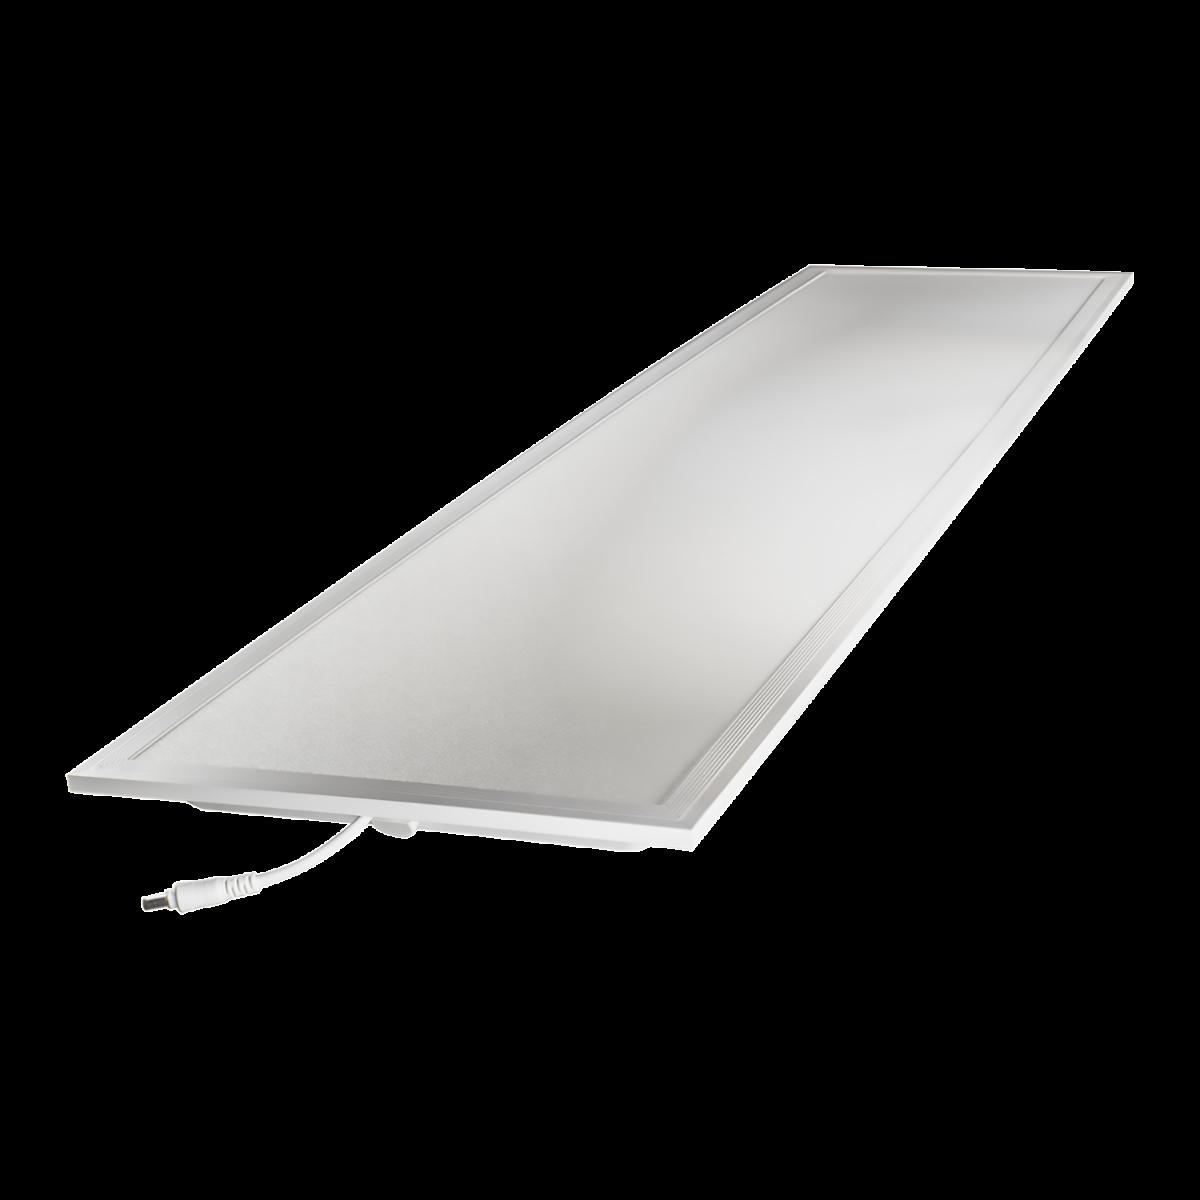 Noxion LED Paneeli Delta Pro Highlum V2.0 40W 30x120cm 6500K 5480lm UGR <19 | Päivänvalo Valkoinen - Korvaa 2x36W